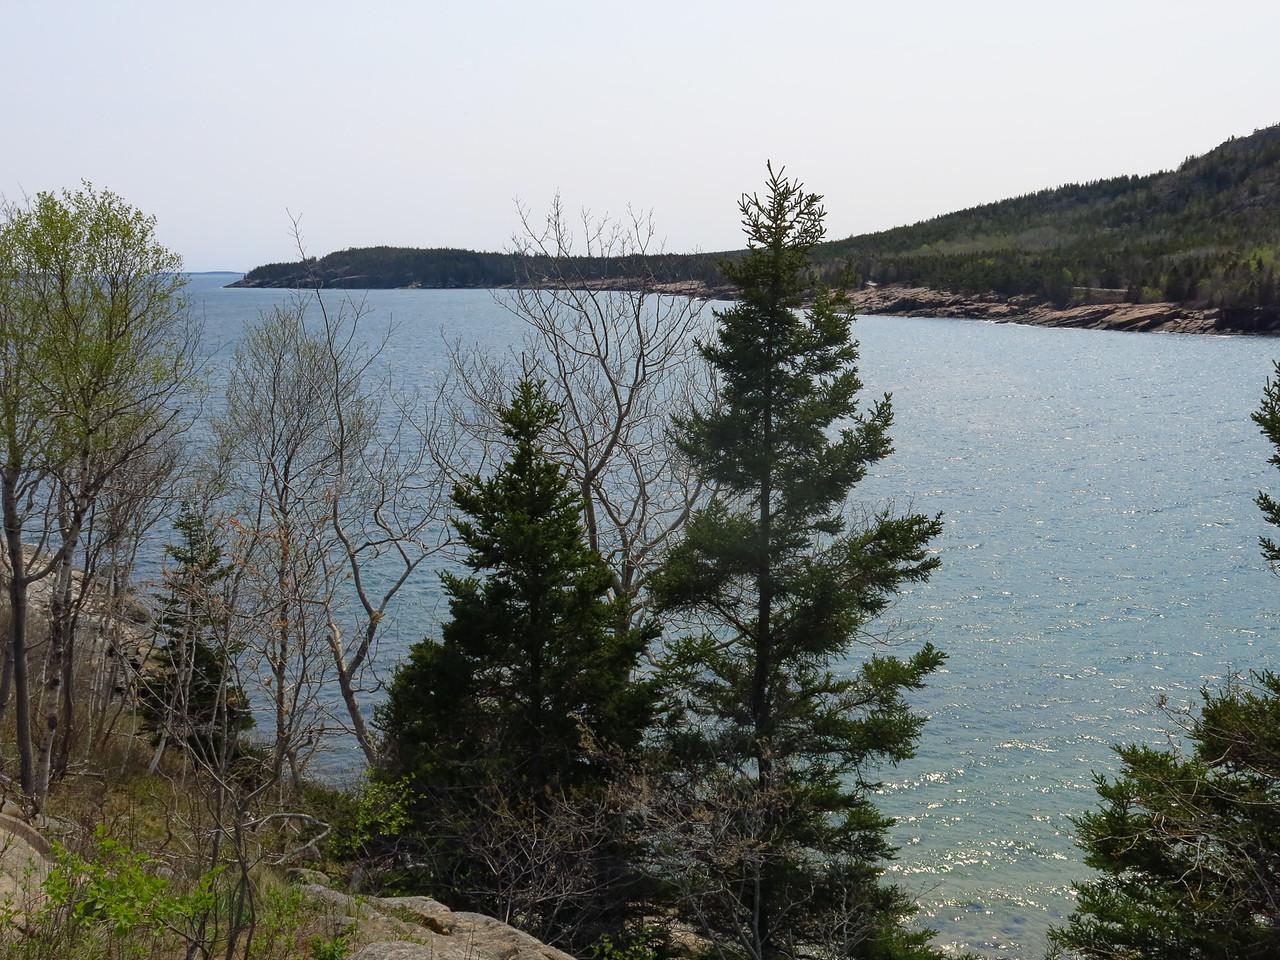 2016-05-12 Acadia (105)